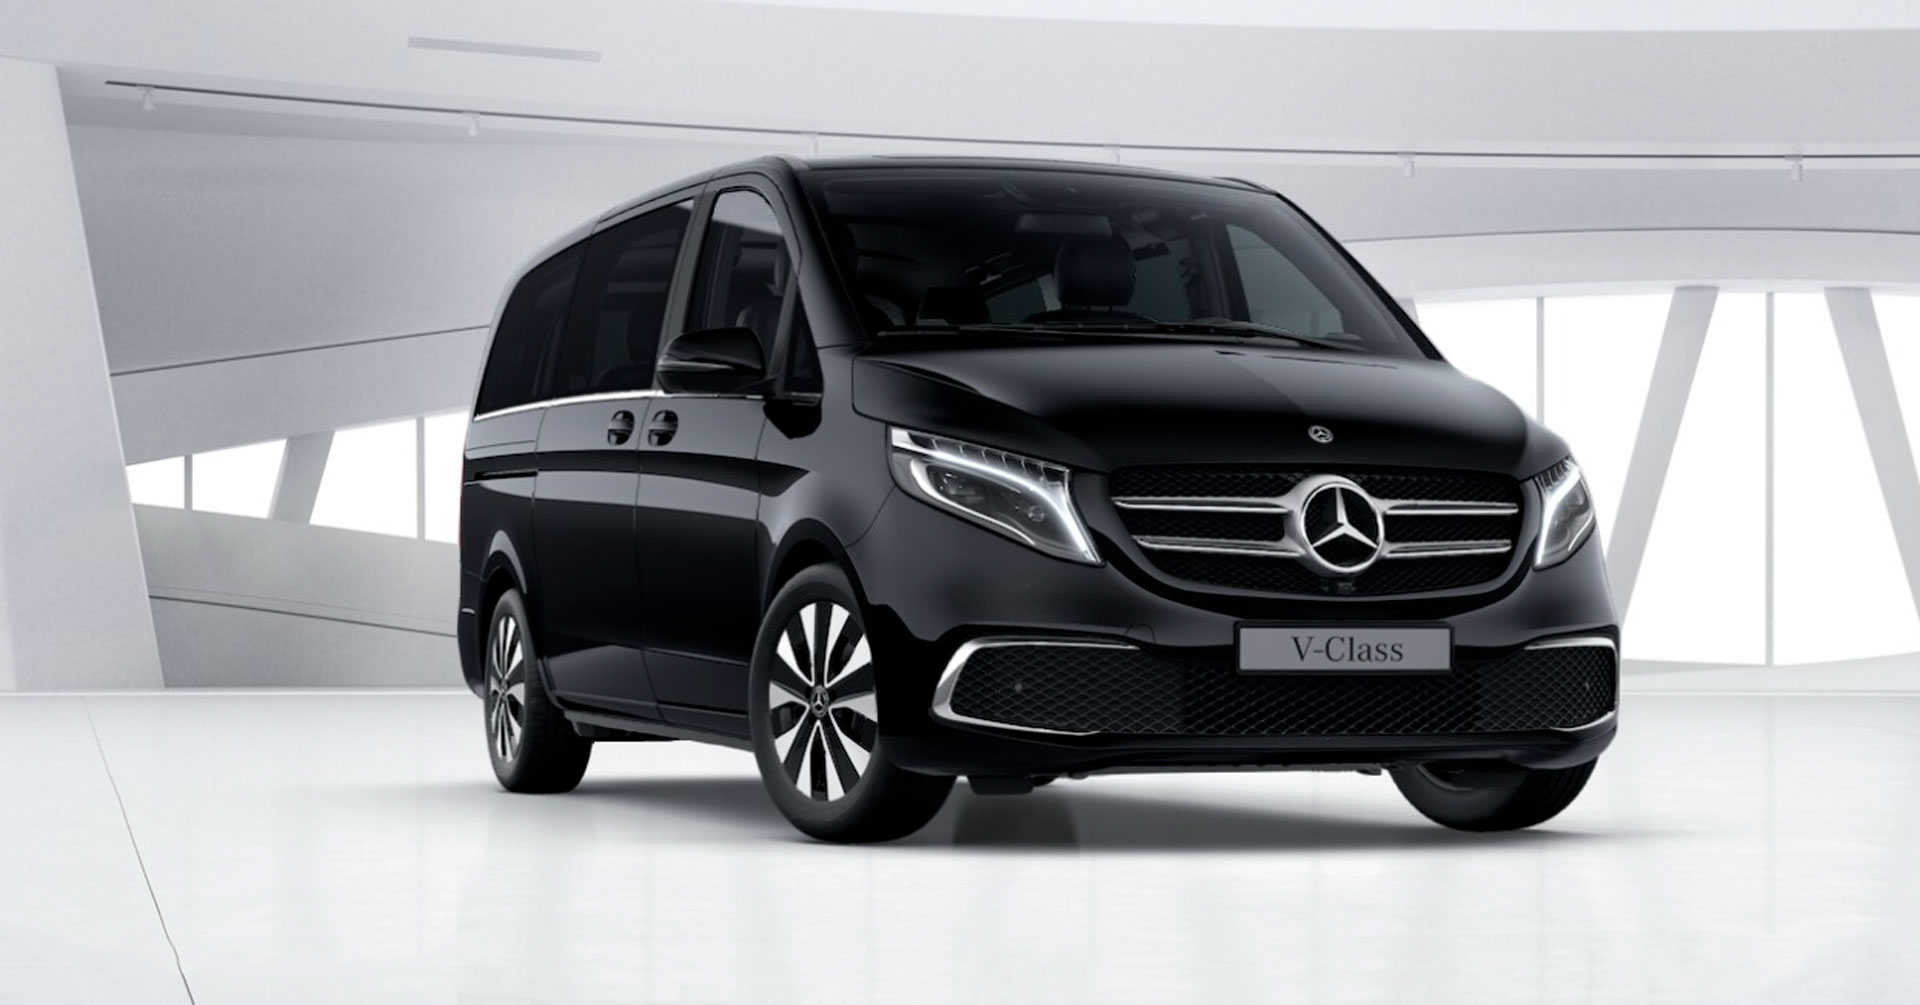 Mercedes-Benz V-Class 5152600082